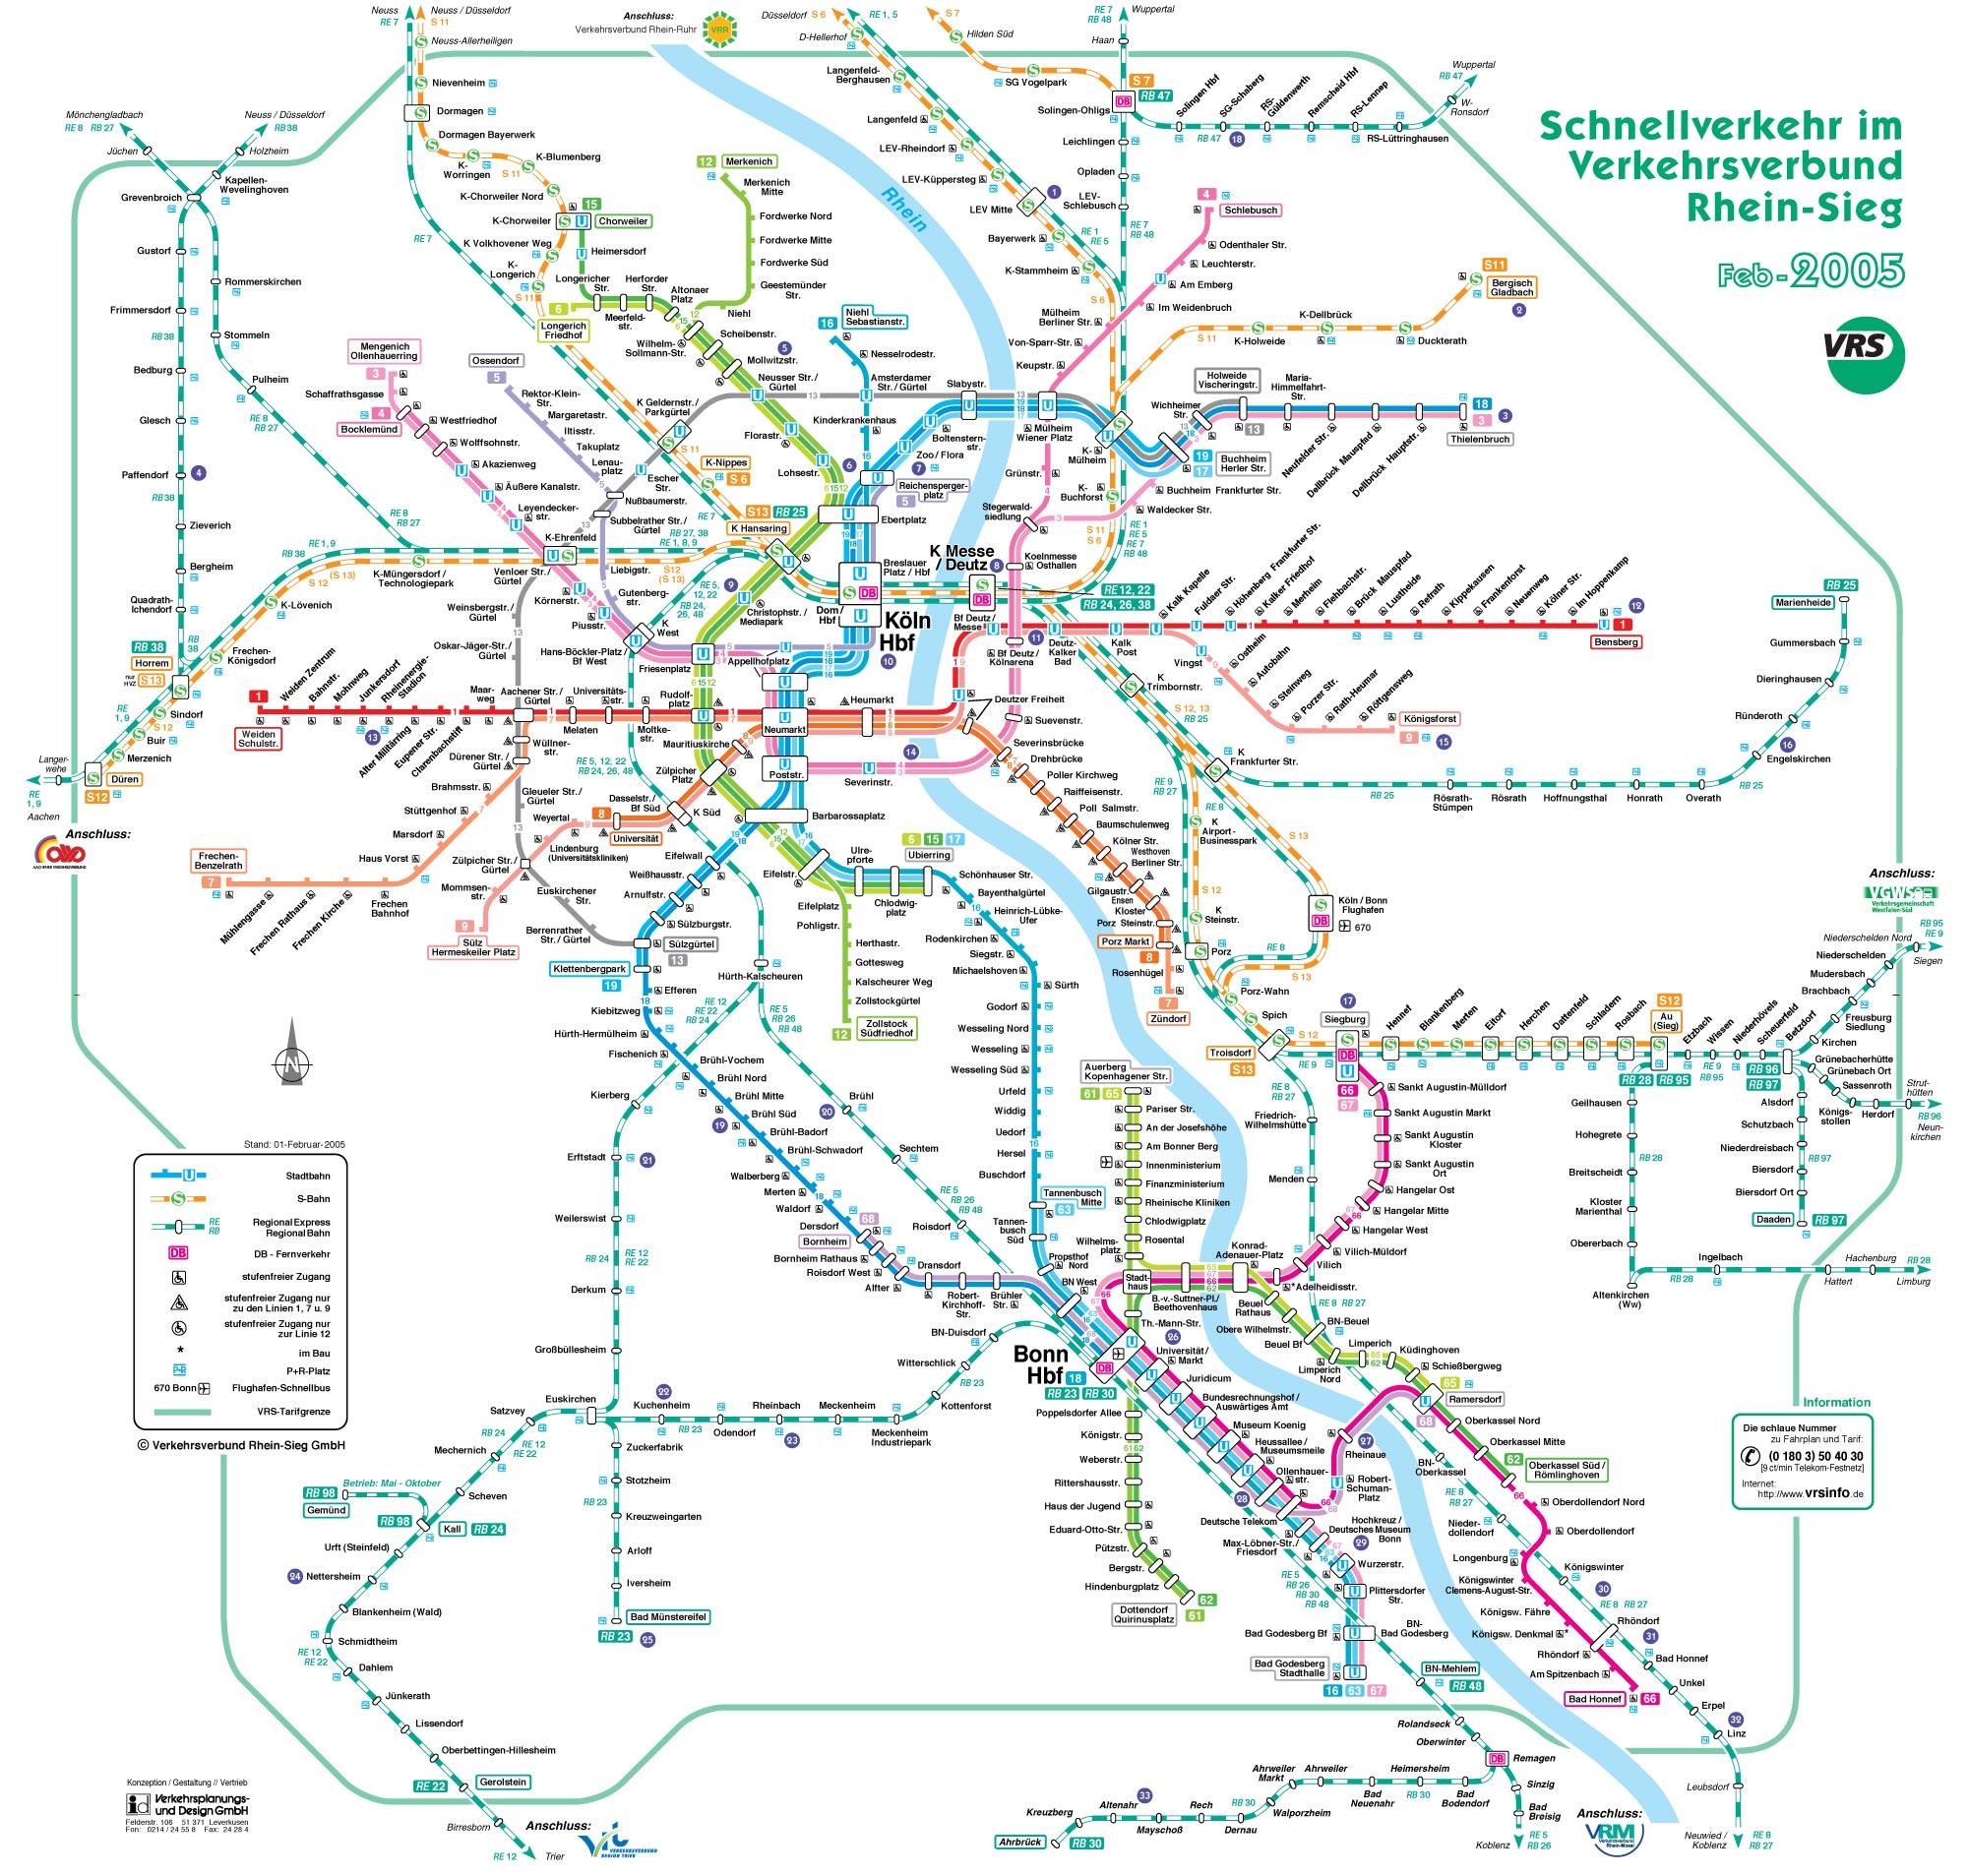 гон конг схема метро